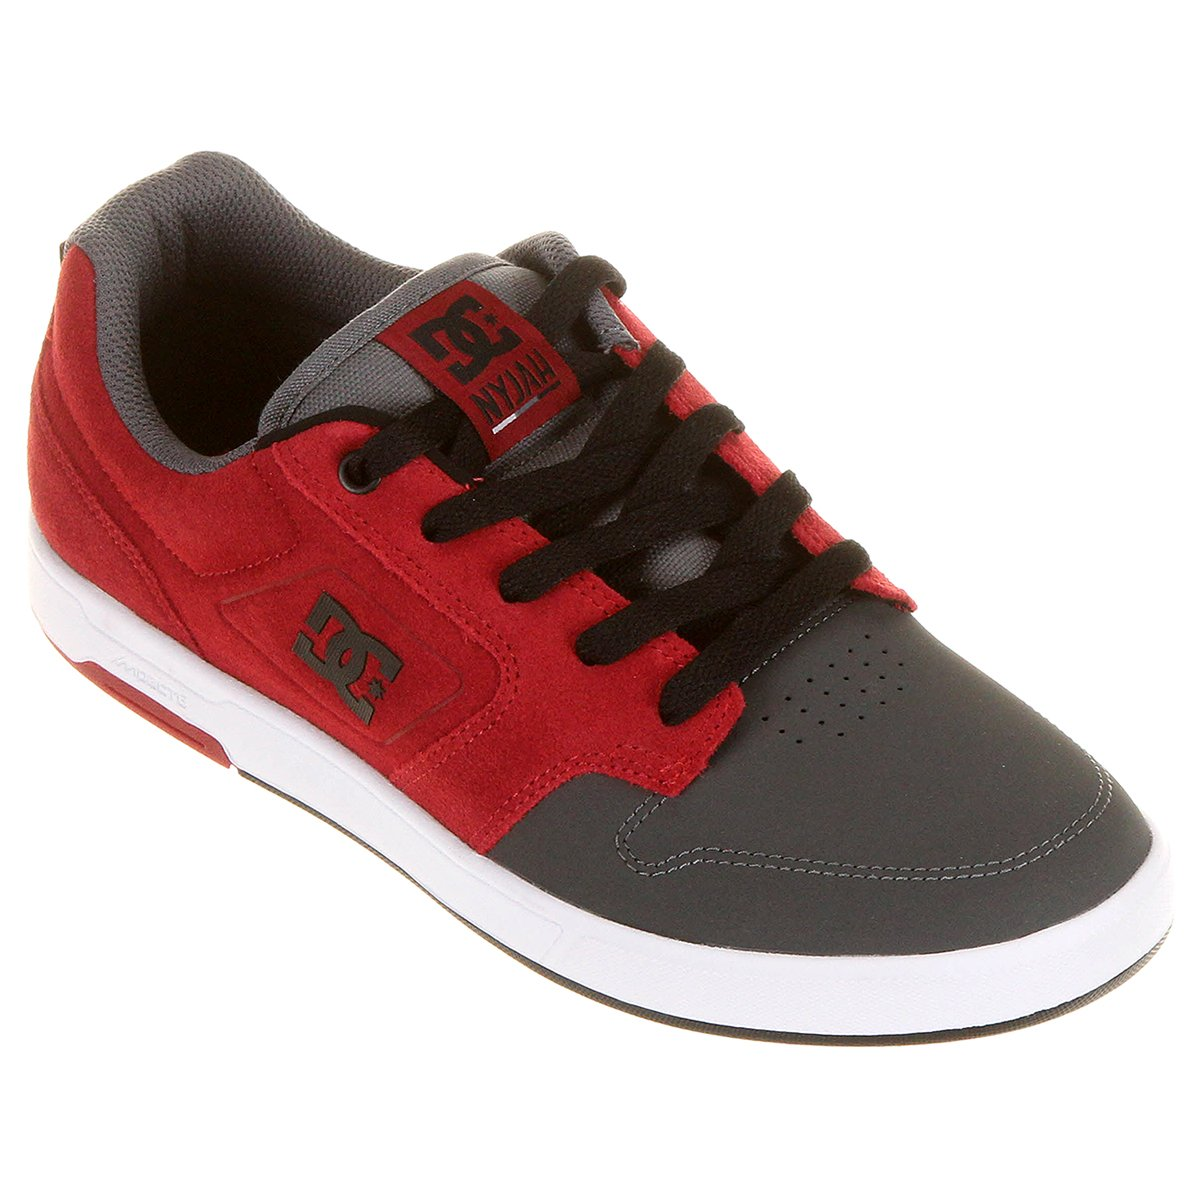 5927dd7625 Tênis DC Shoes Nyjah Se Shoe Gre - Compre Agora